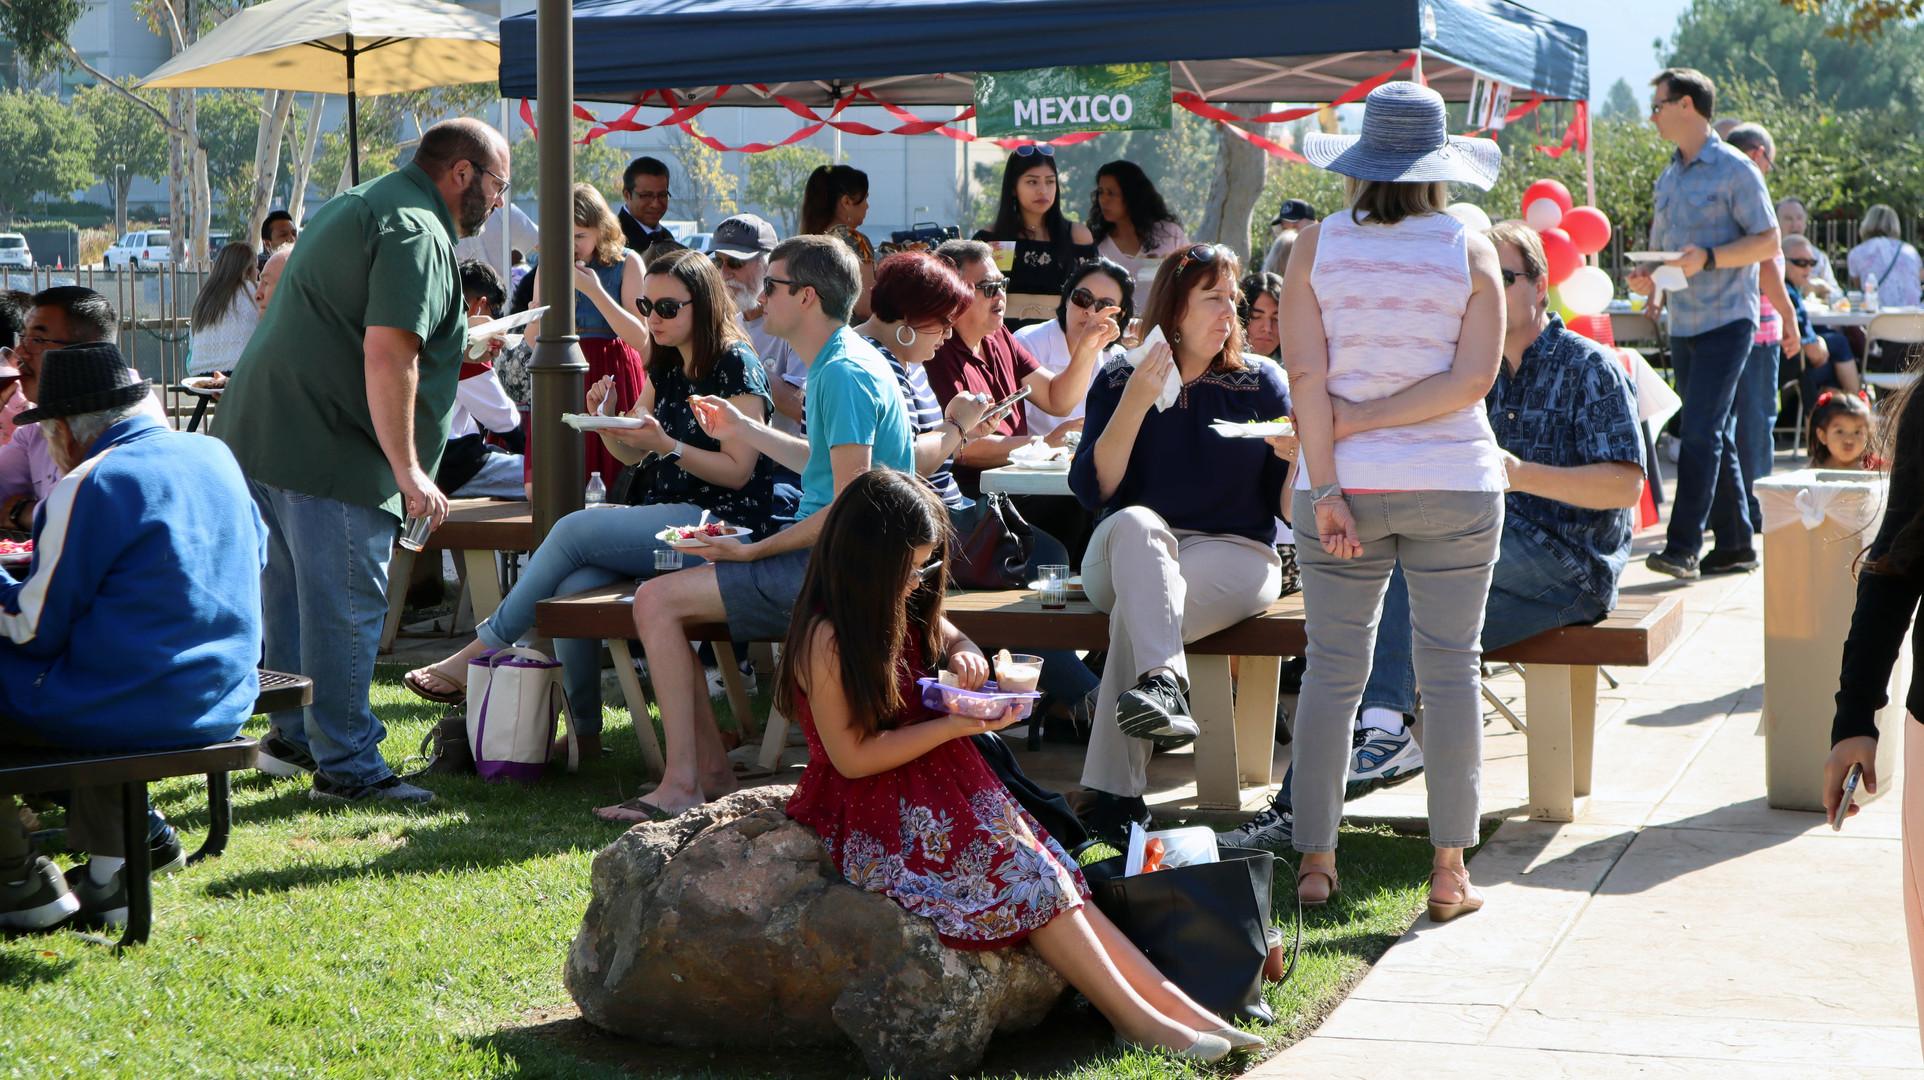 patio crowd 3.JPG